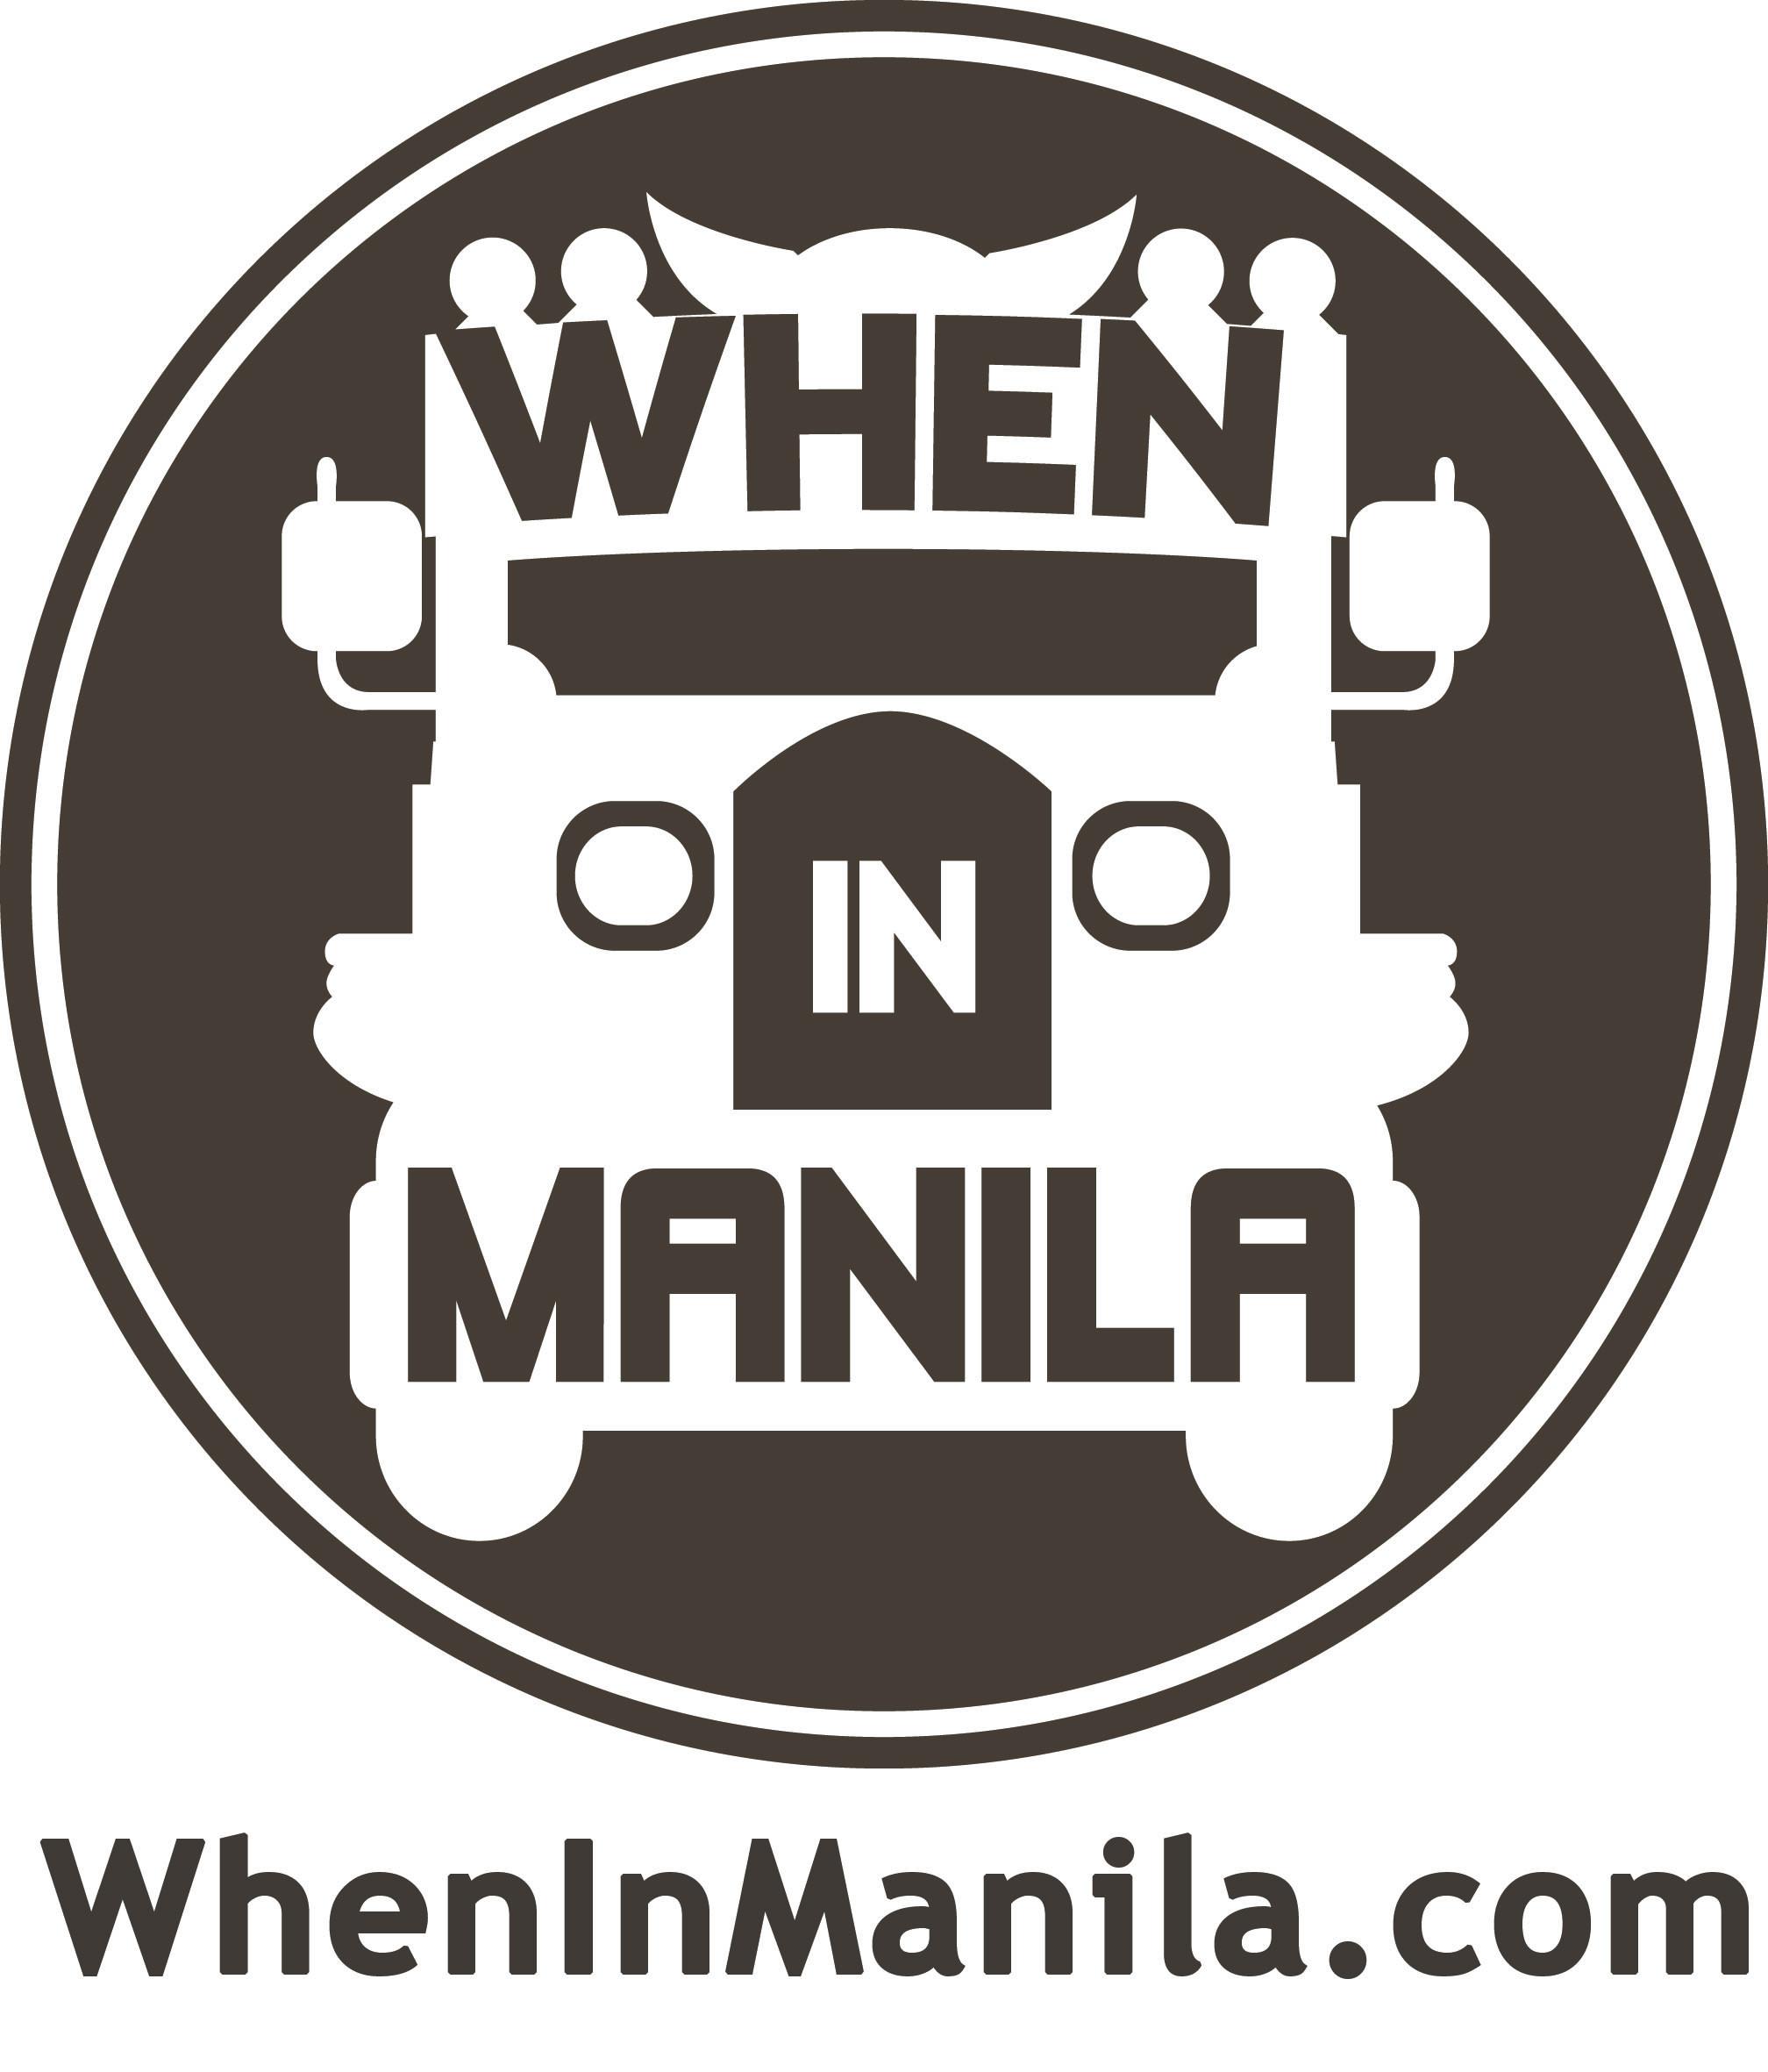 WhenInManila-com-HiRes-logo.jpg